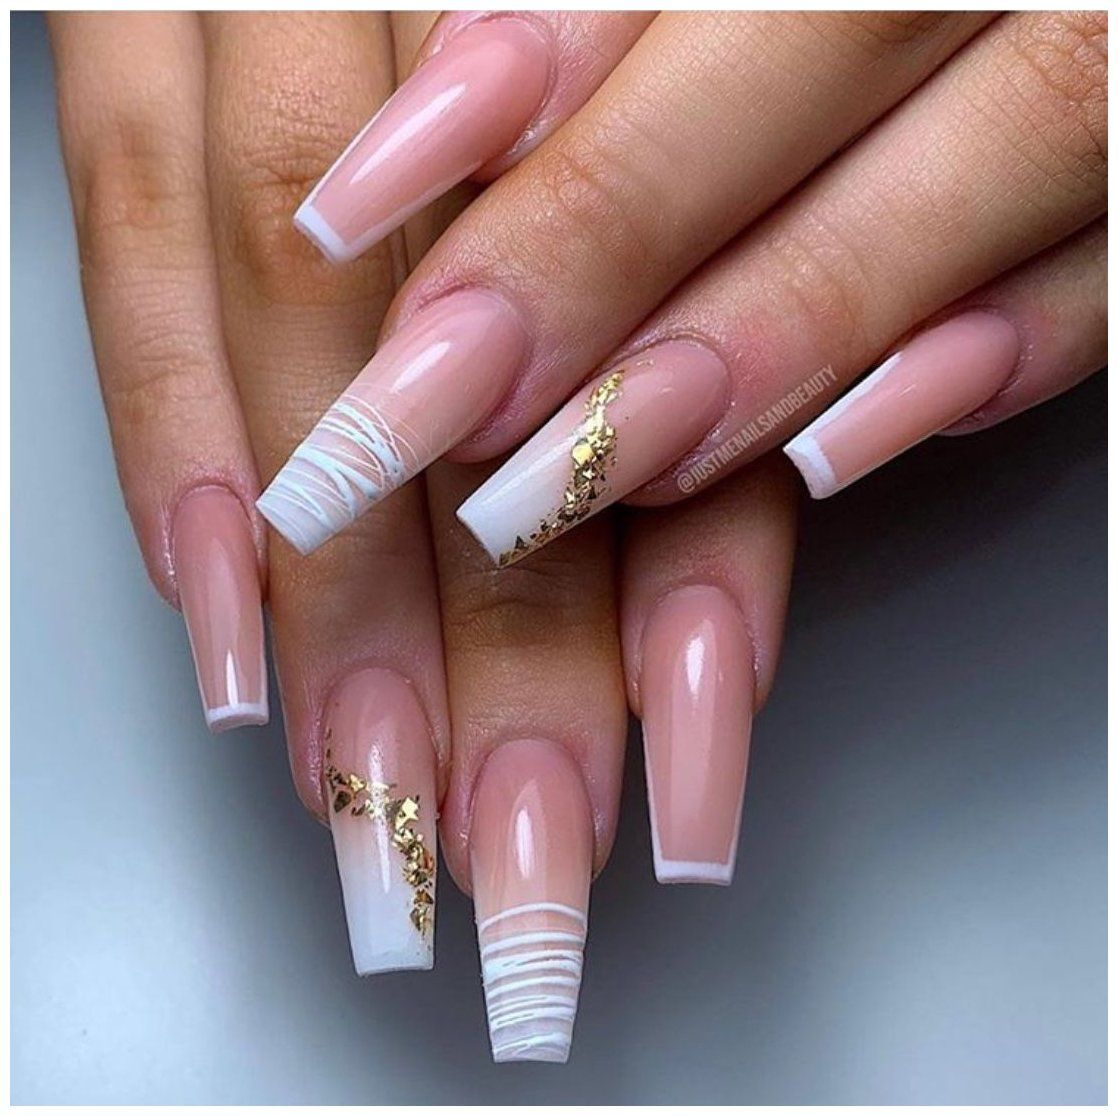 Понравилось | Stylish nails designs, Stylish nails, Fall